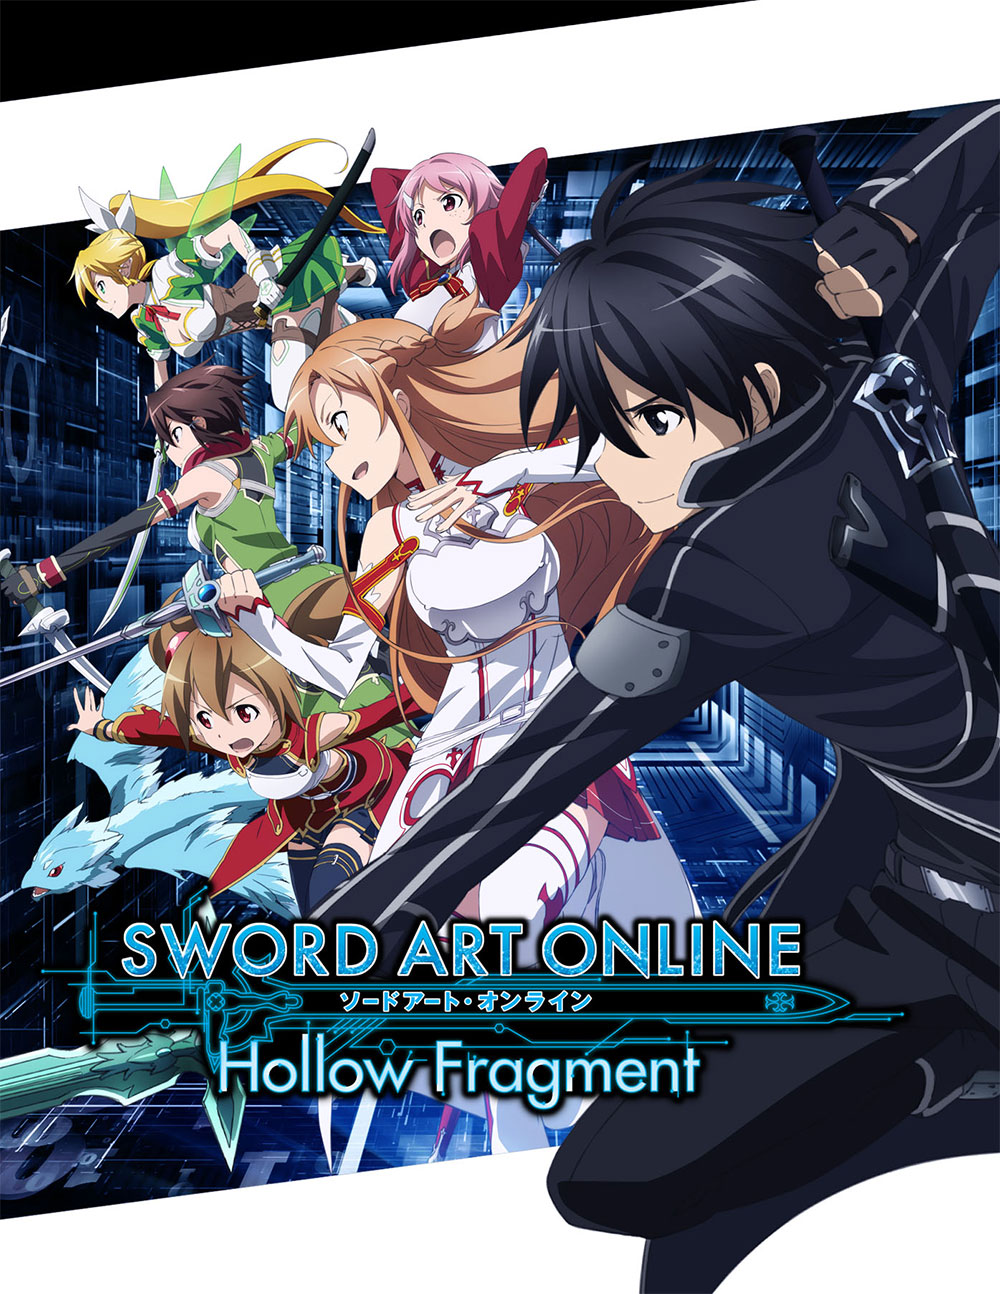 Sword-Art-Online-Hollow-Fragment-NA-Visual